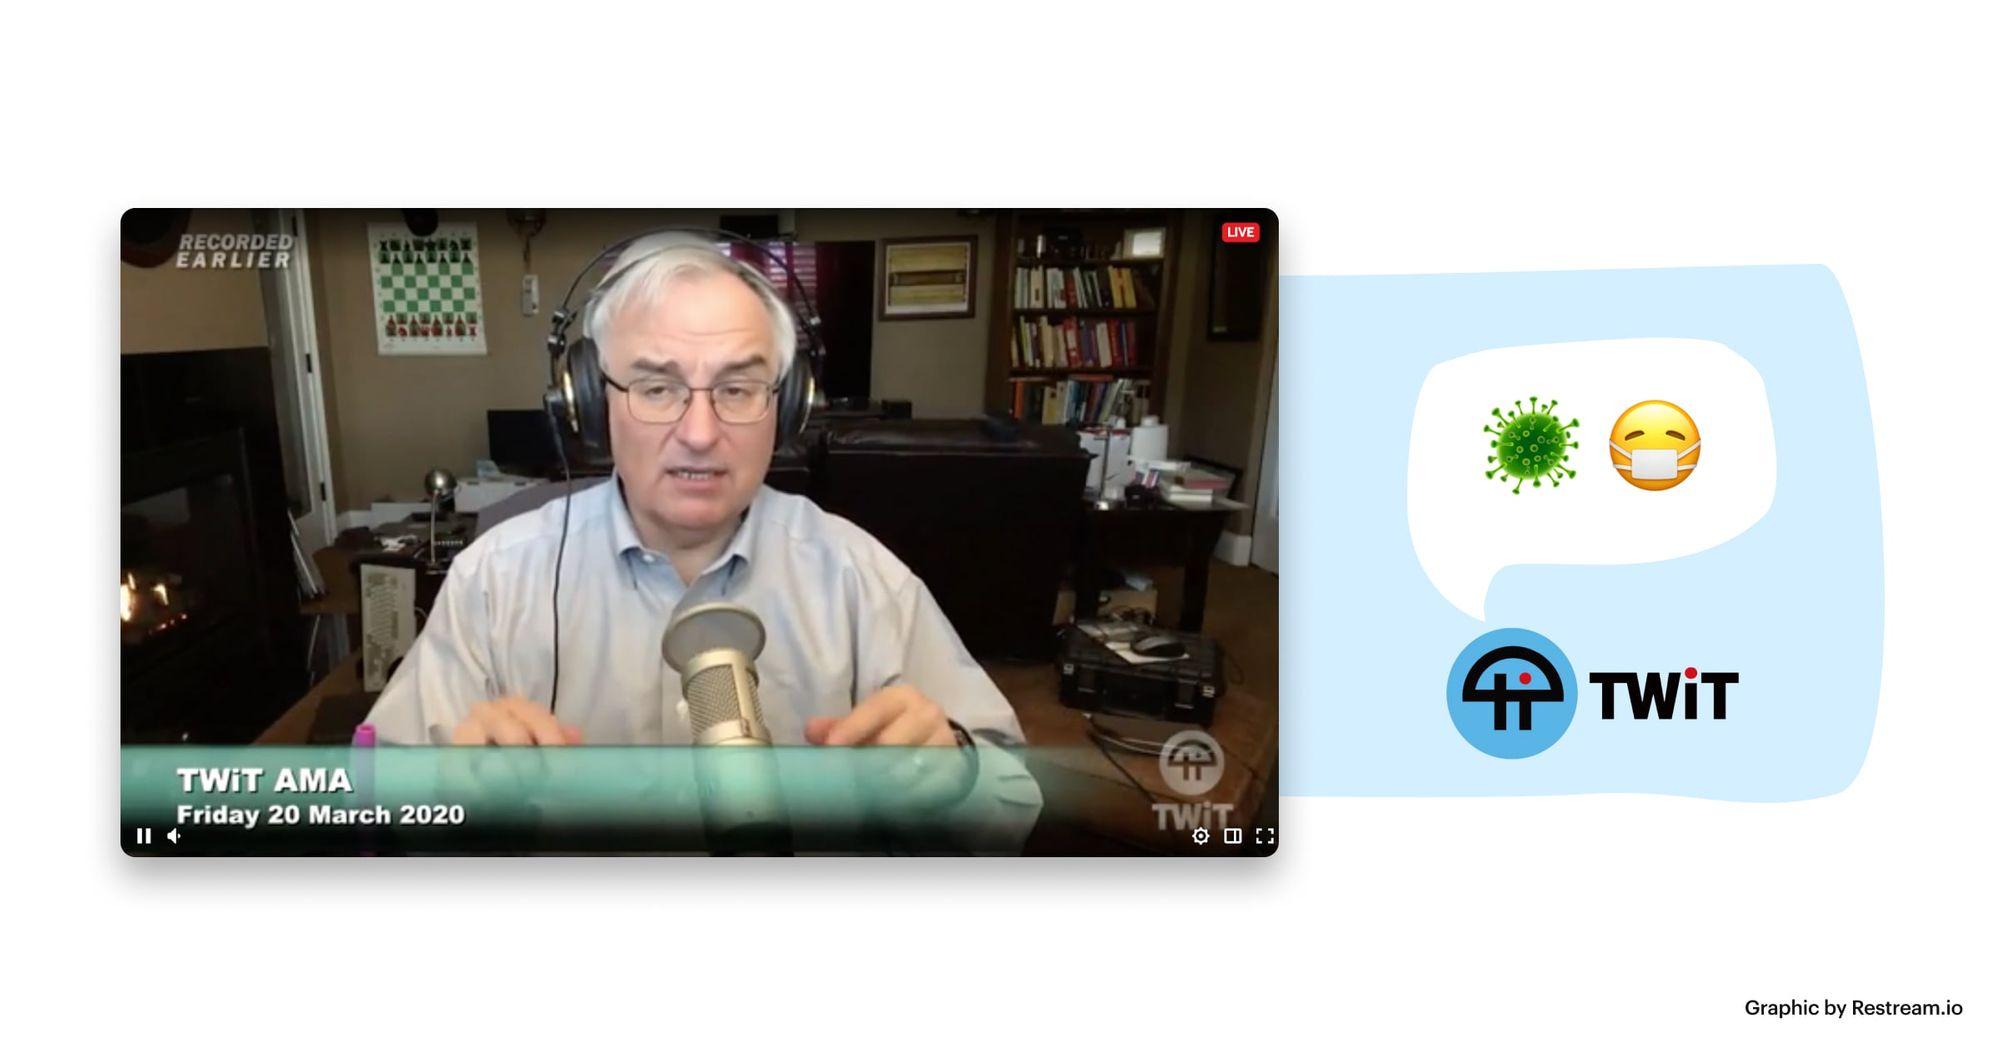 Screenshot from TWiT AMA live broadcast